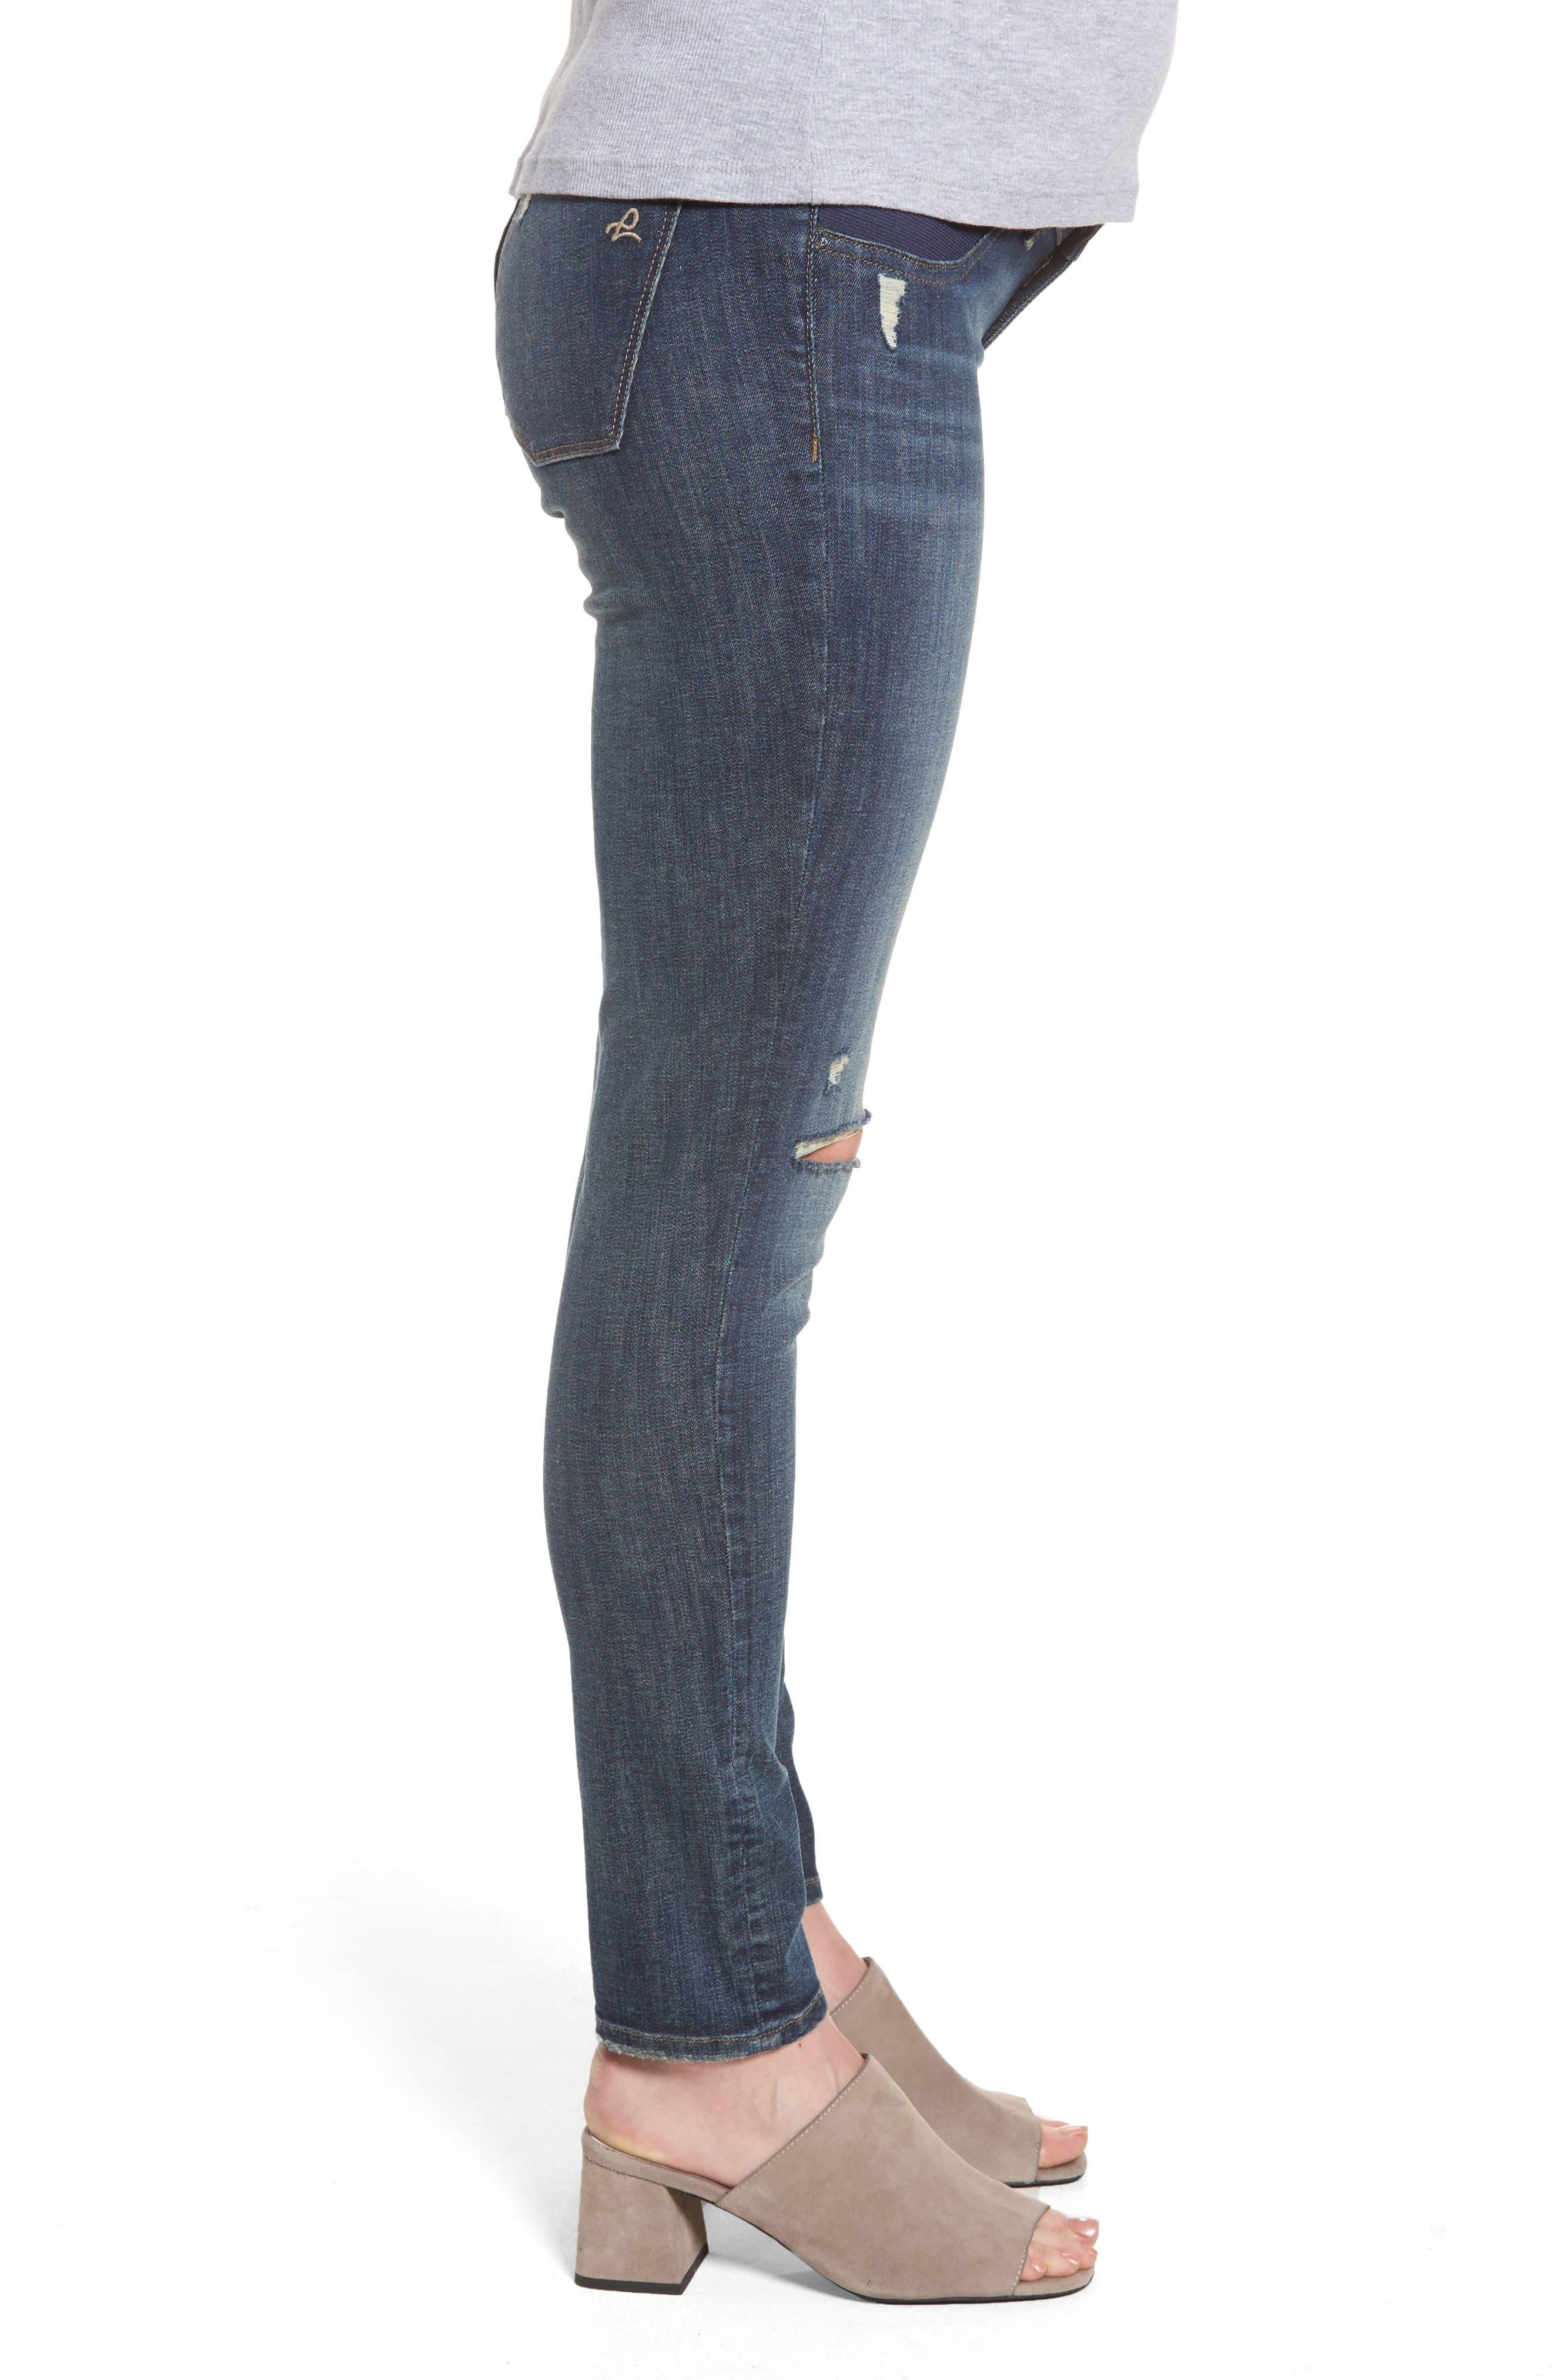 Emma Power Legging Maternity Jeans,                             Alternate thumbnail 3, color,                             405